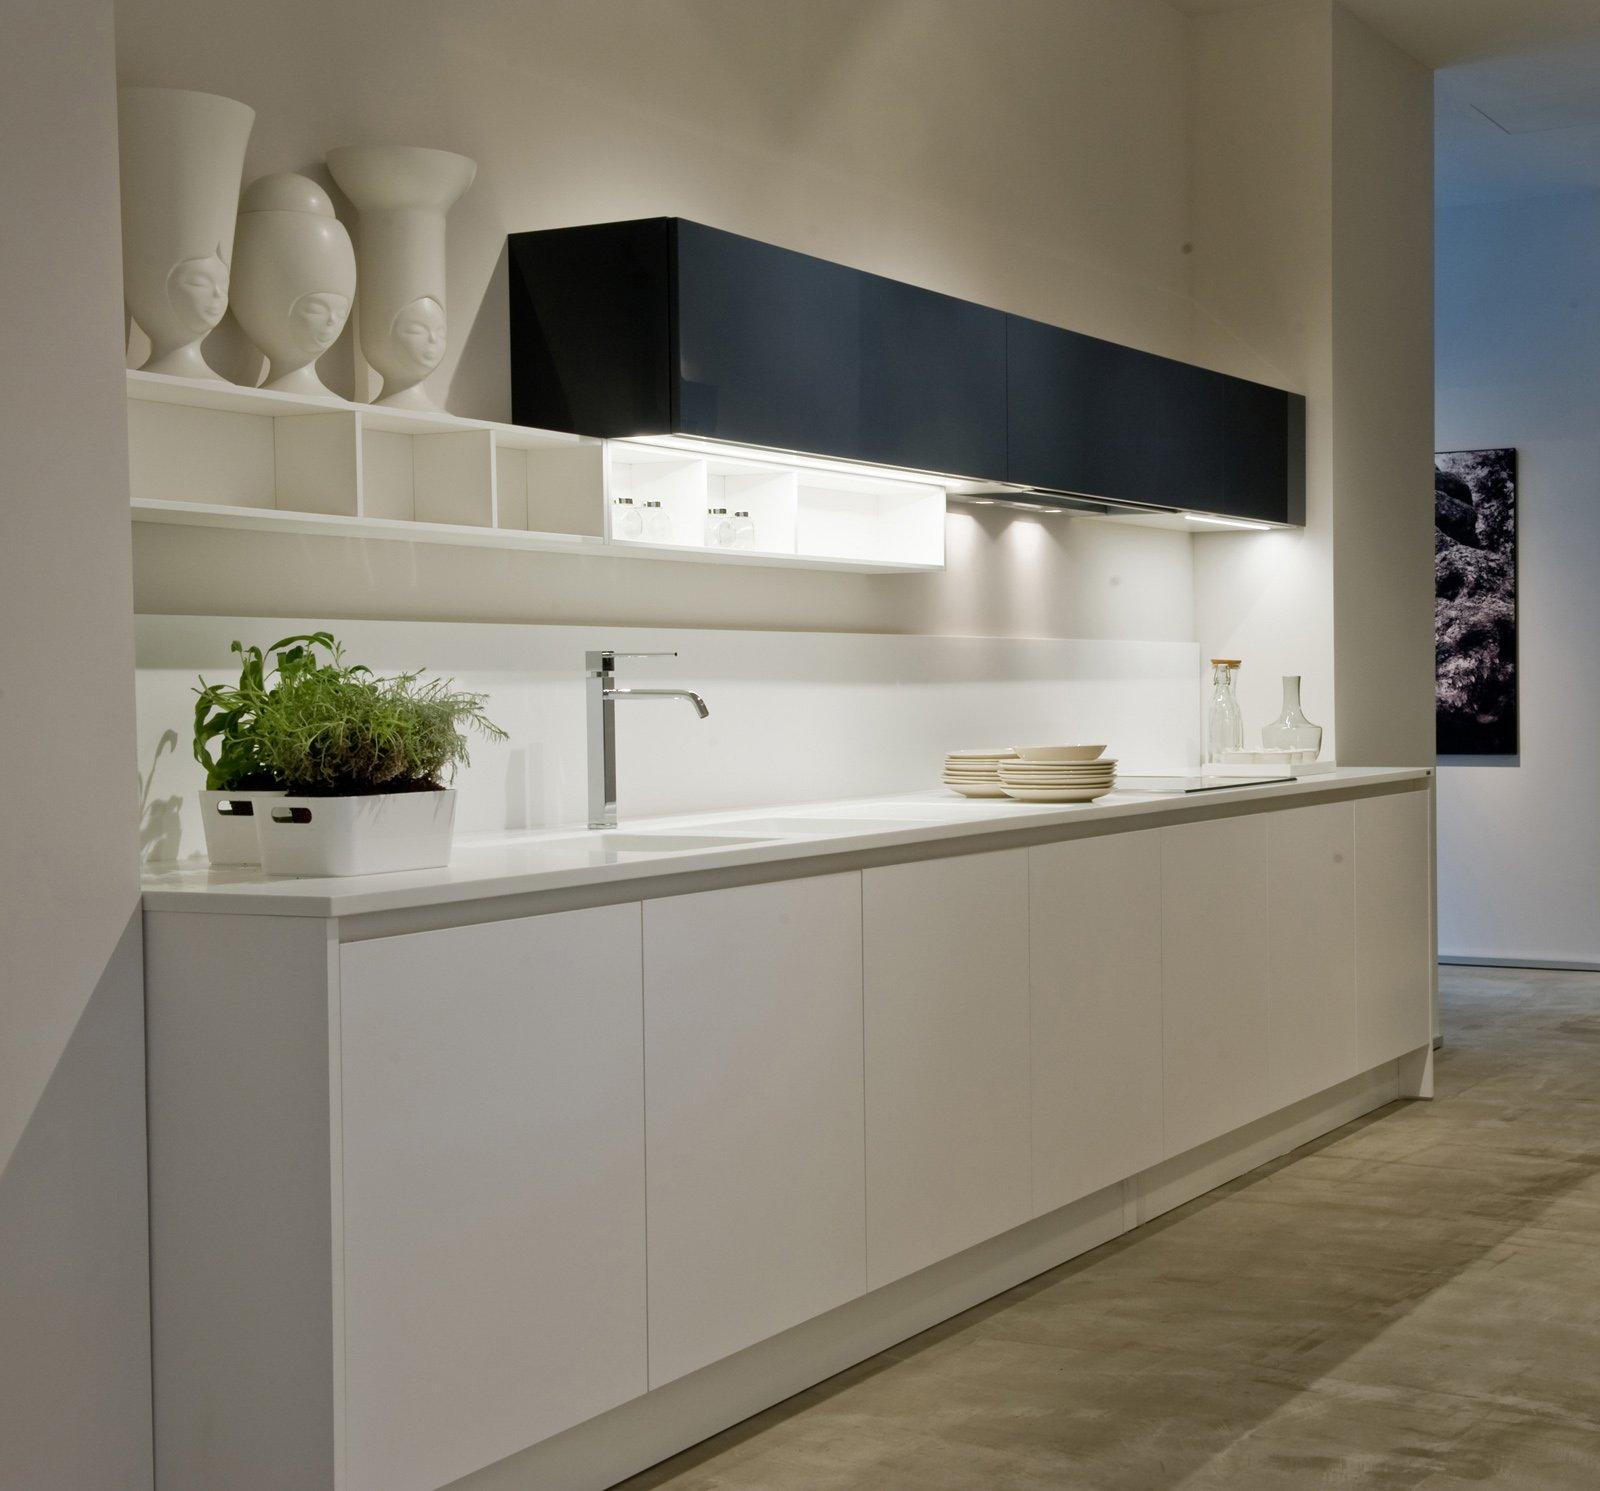 ErnestoMeda: Nuovo Showroom A Bari Cose Di Casa #4D5B1A 1600 1491 Veneta Cucine O Ernestomeda